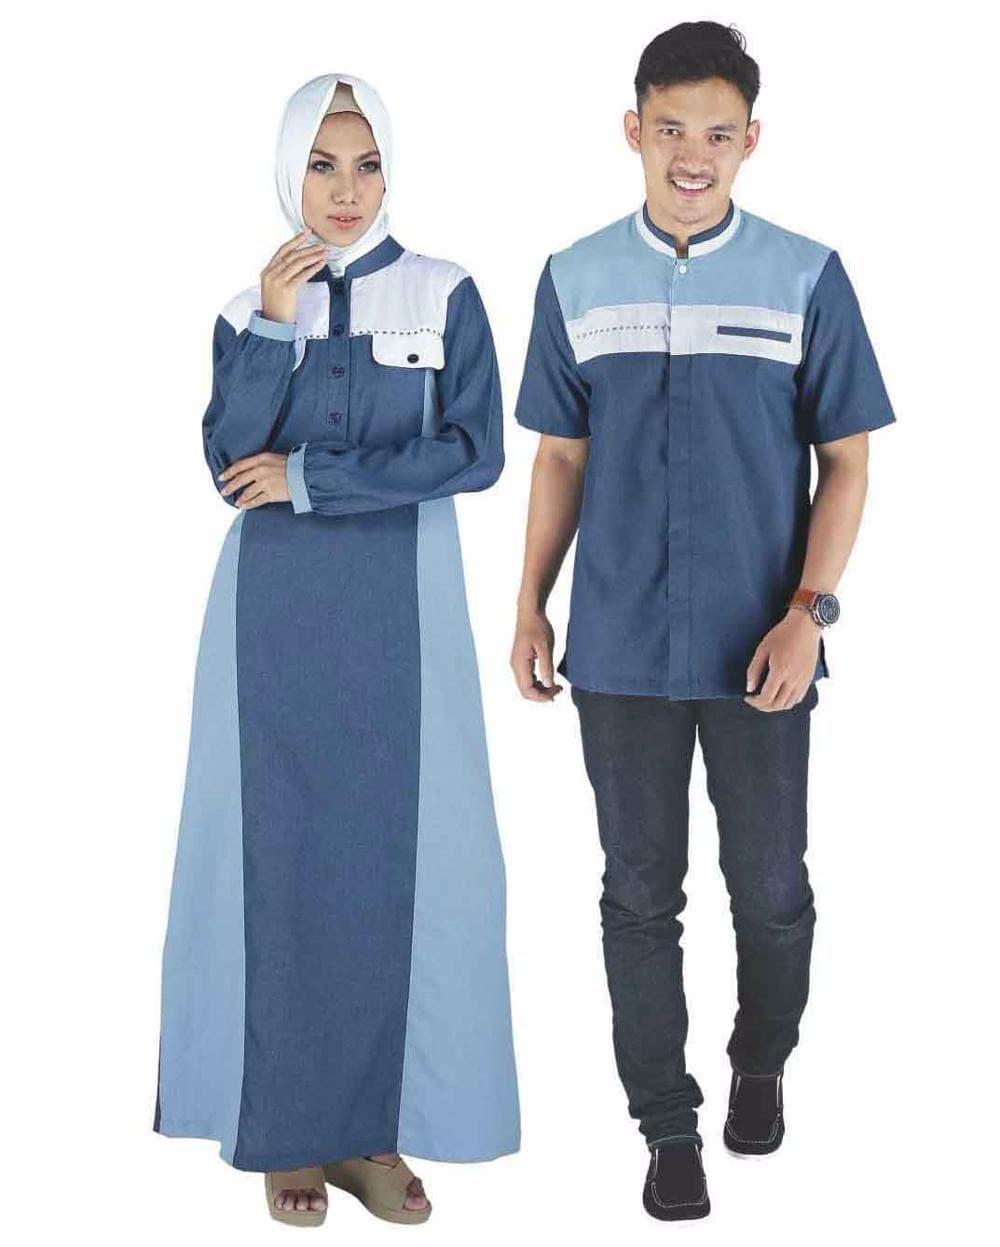 Java Seven Mmt 021 Baju Koko Muslim Pria Cotton 3d Murah Dan Keren Garsel Fashion Fny 003 Source